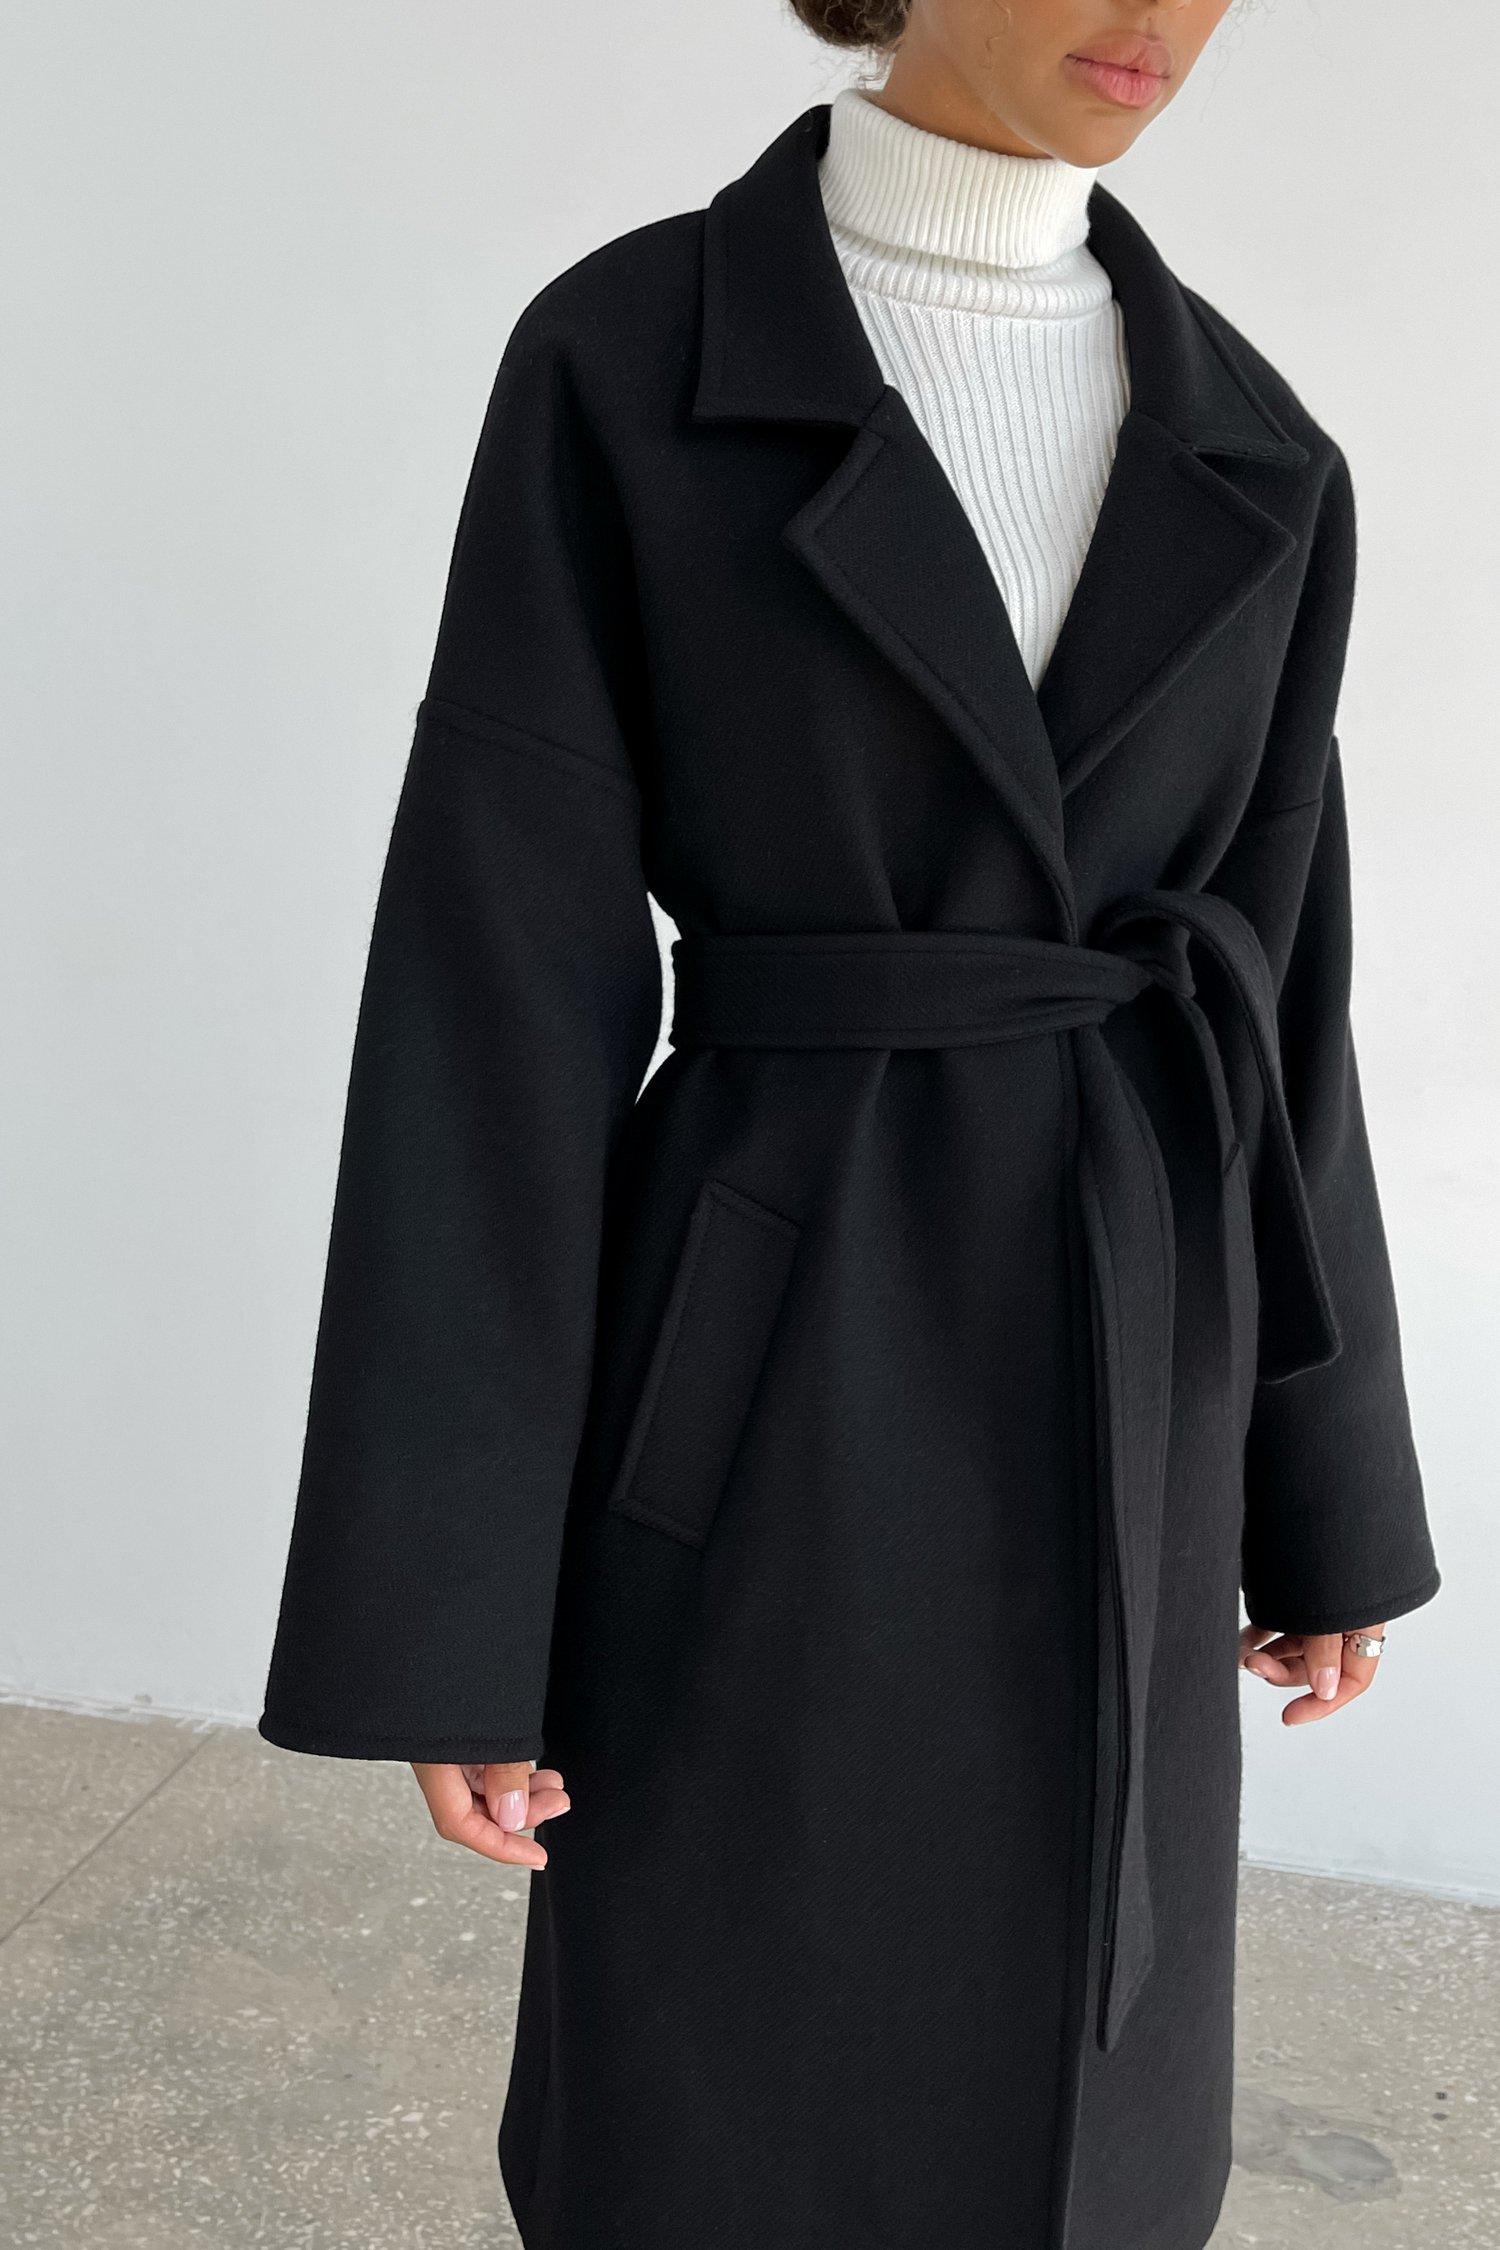 Пальто-халат шерстяное черное - THE LACE